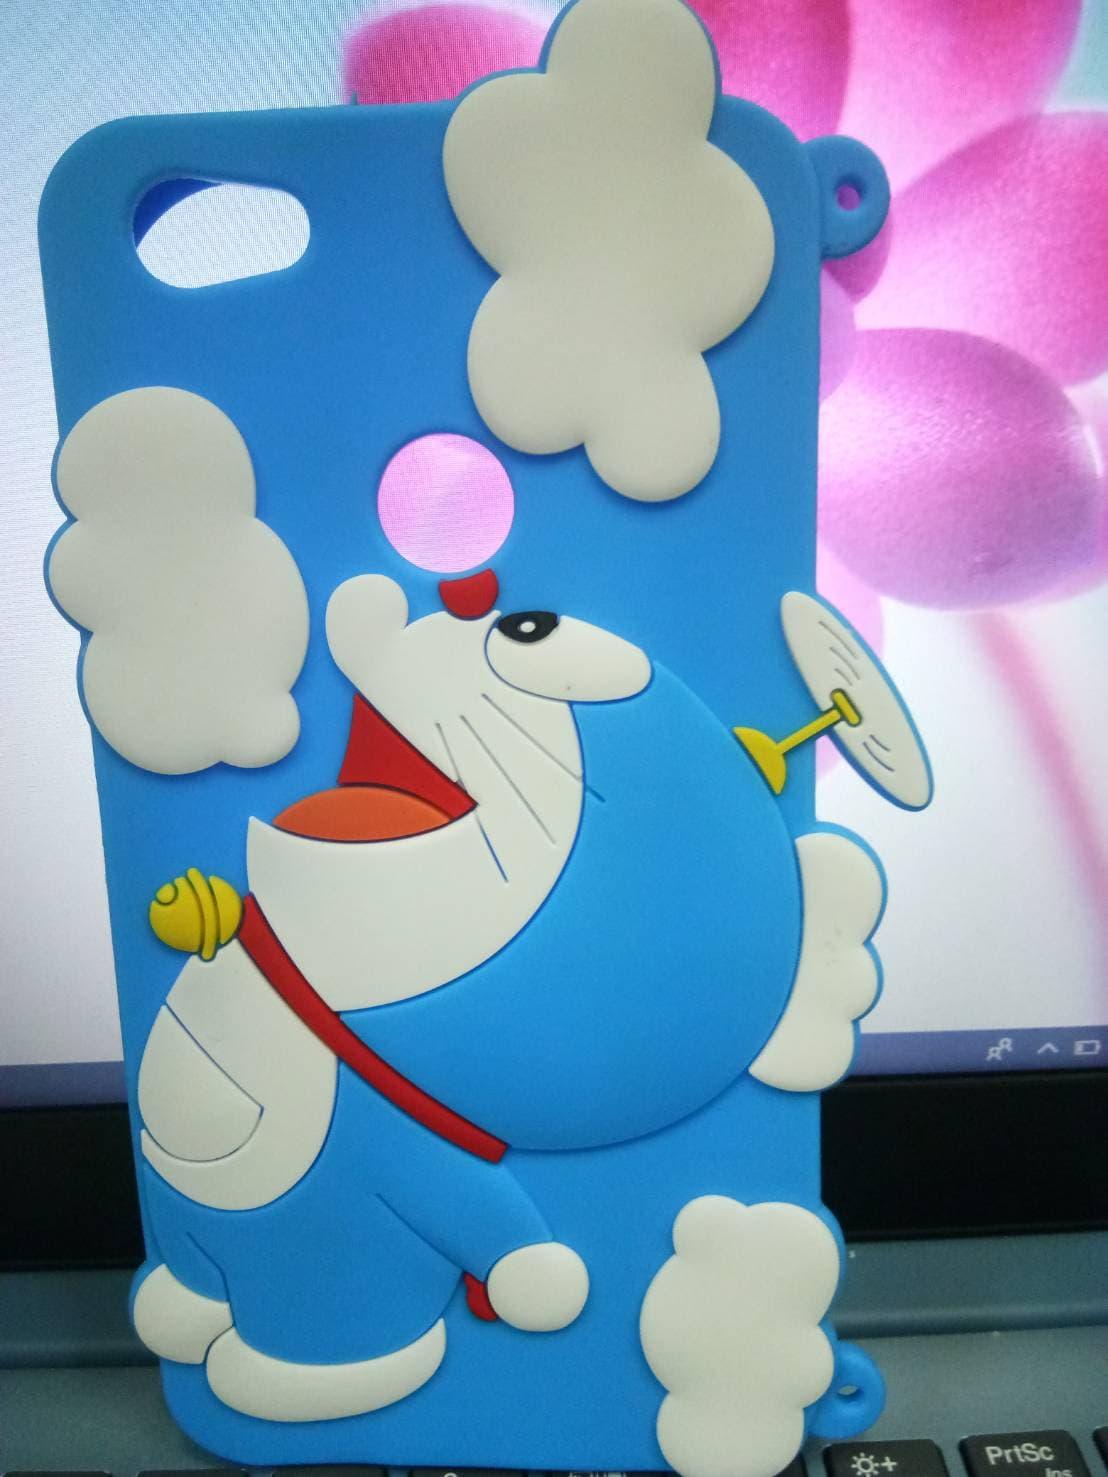 Jual Softase 3d Doraemon Case Hp Lucu Silicon Boneka For Type Iphone Warior Shop